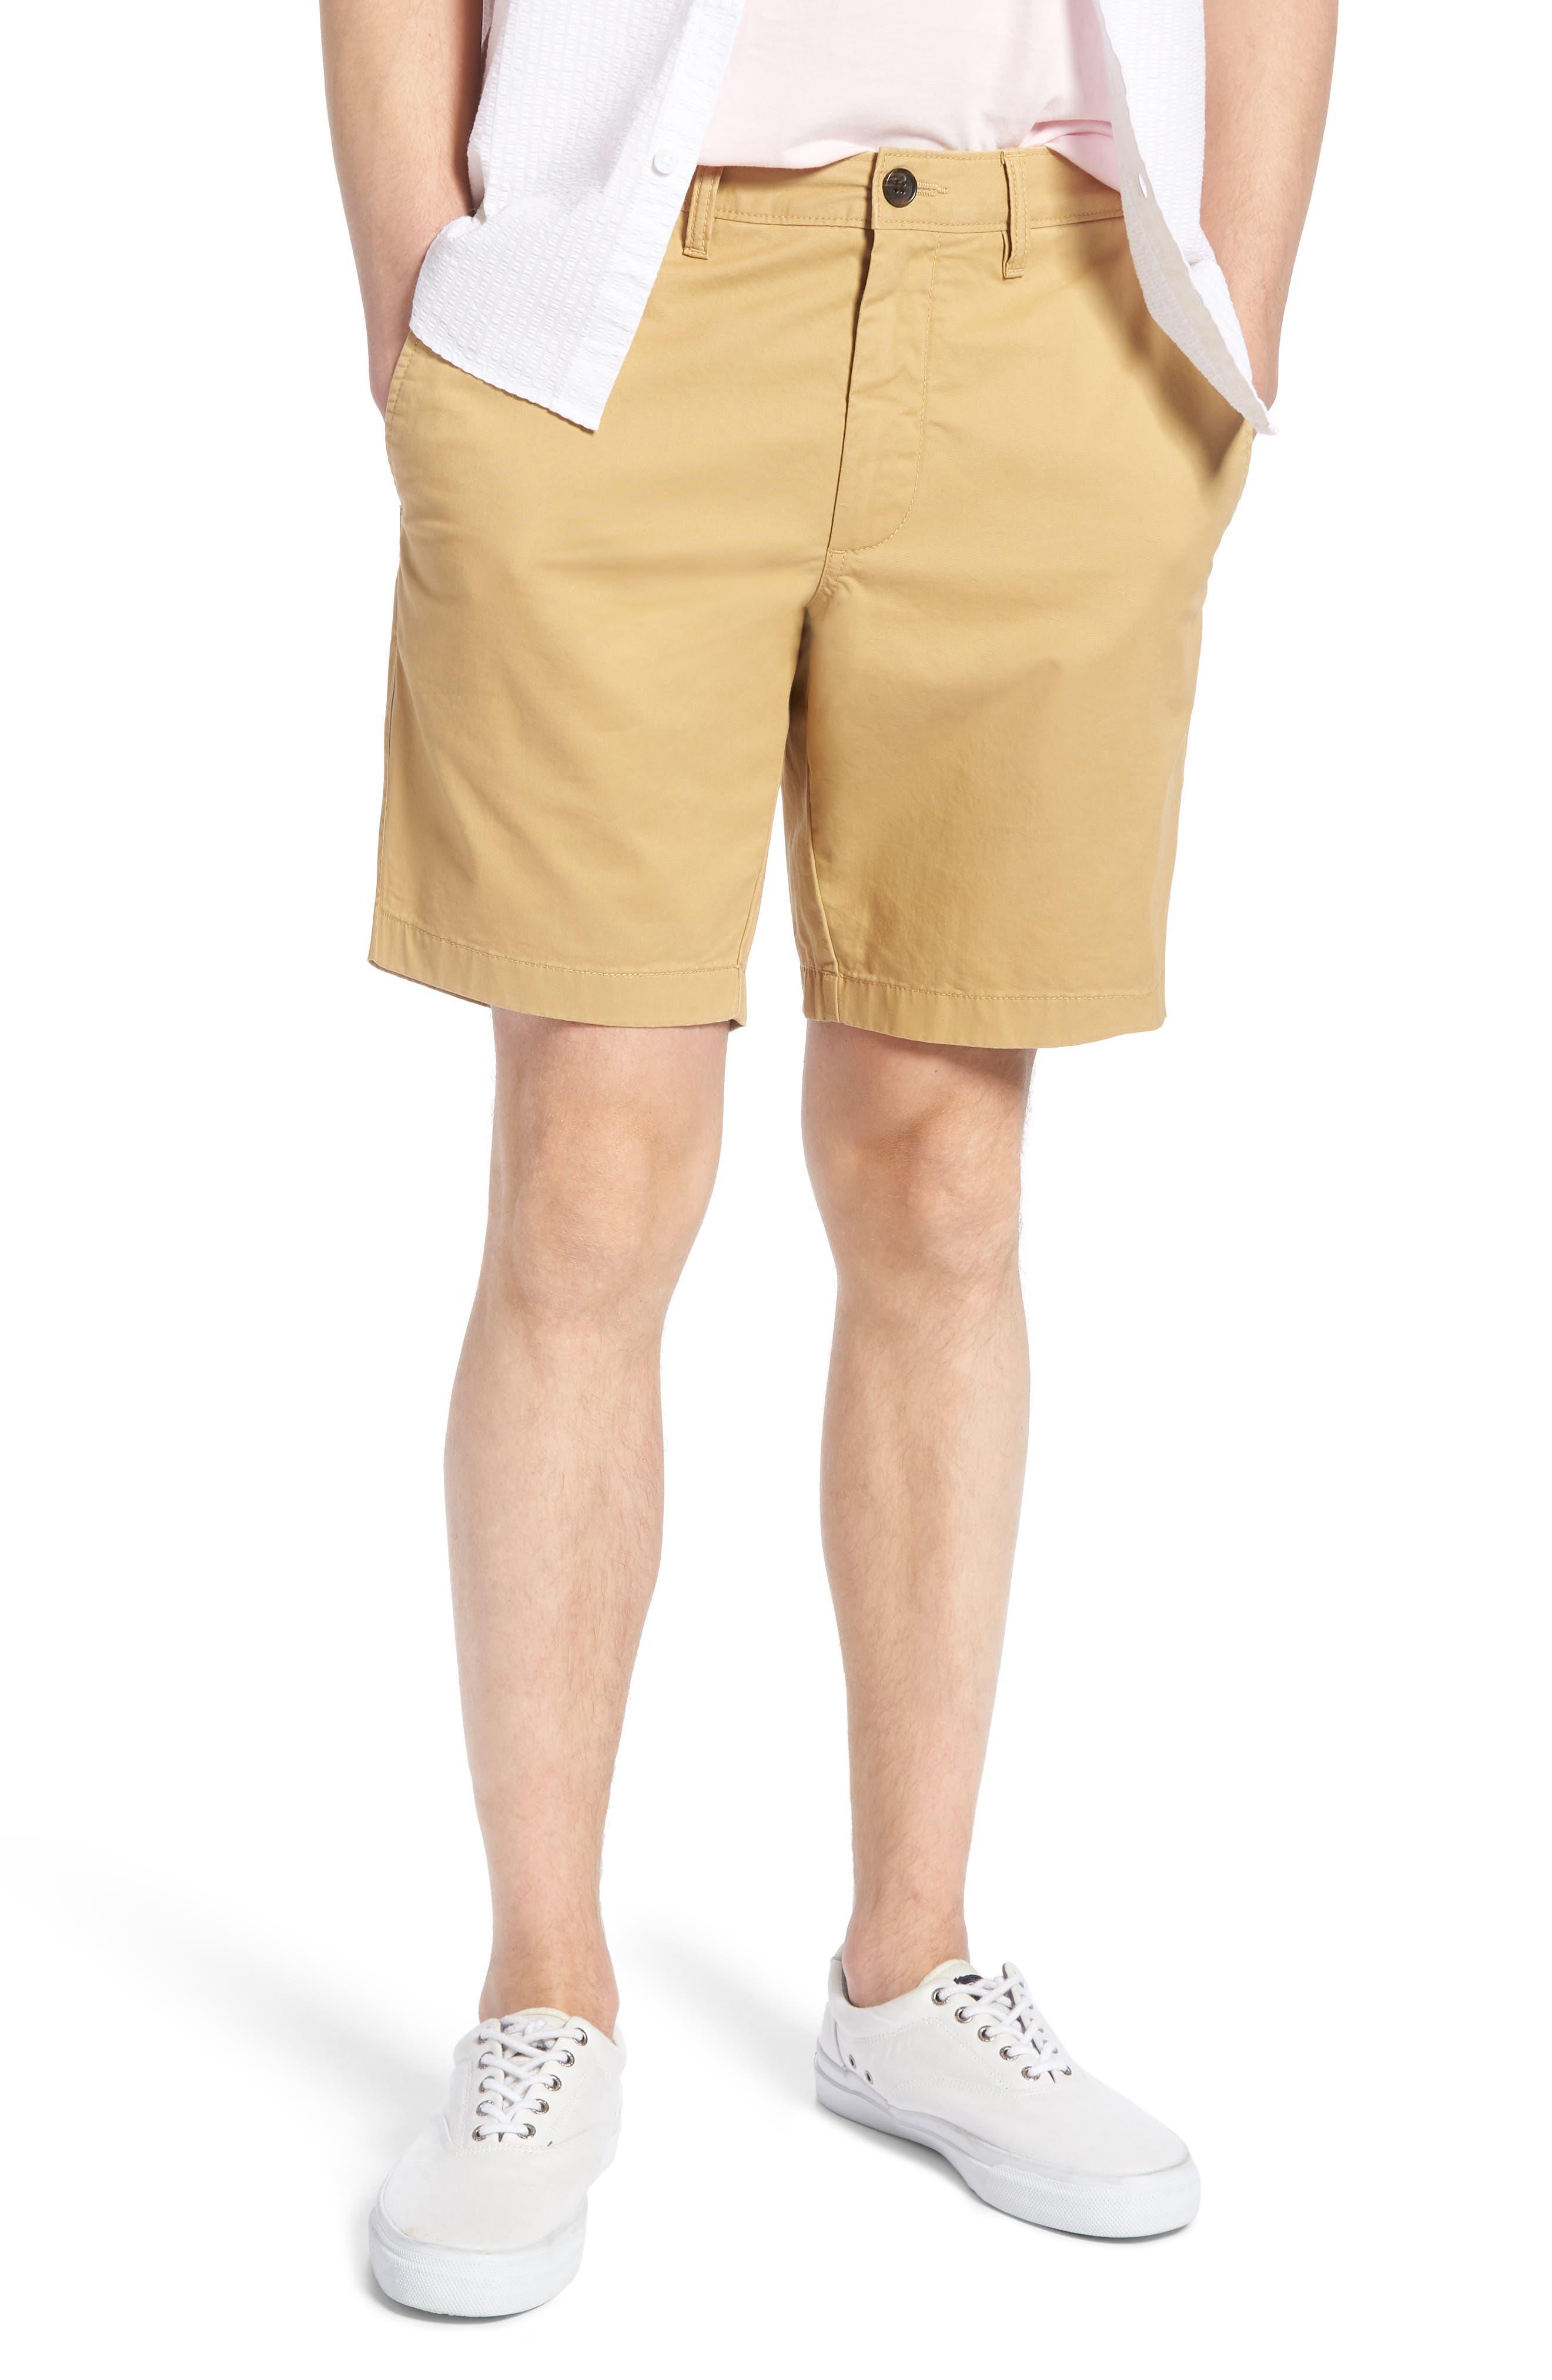 Ballard Slim Fit Stretch Chino 9-Inch Shorts,                         Main,                         color, TAN LARK